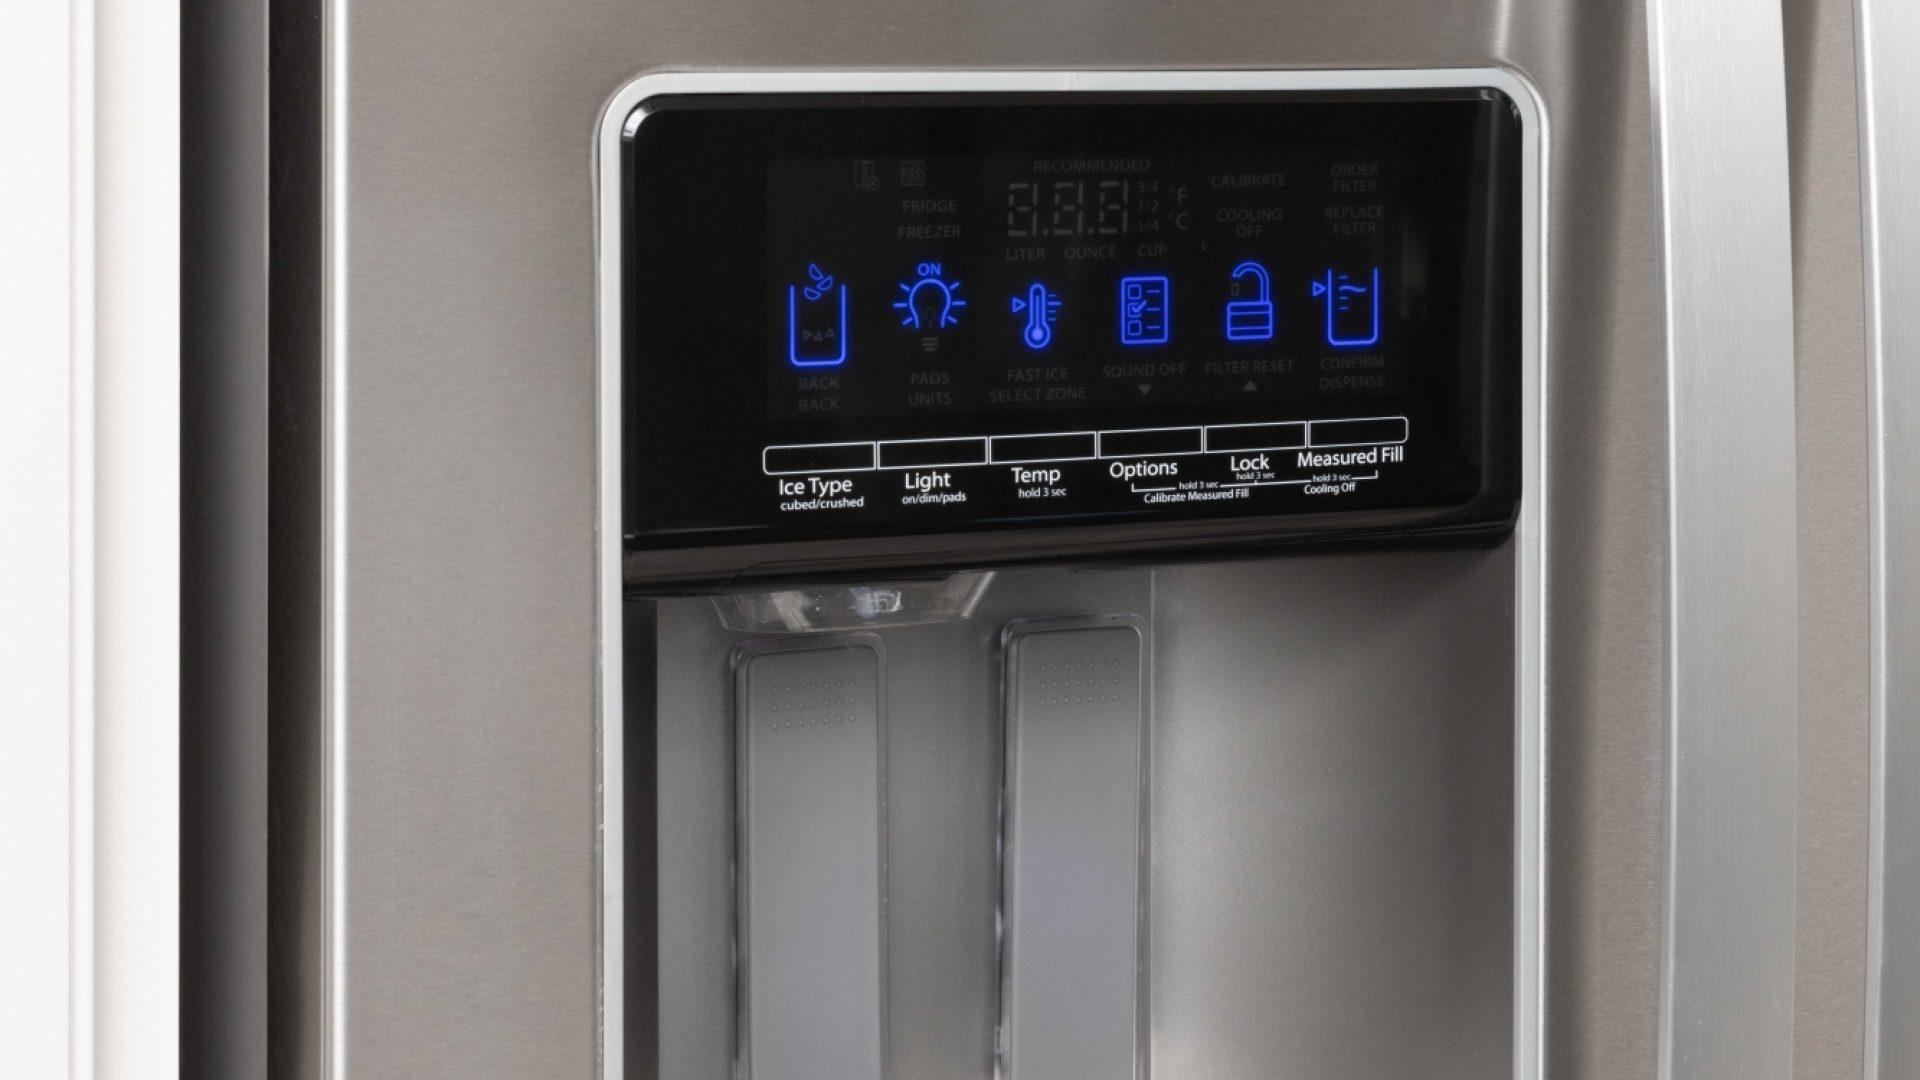 4 frig indoor dispense Disc38 K MY22 4395 on